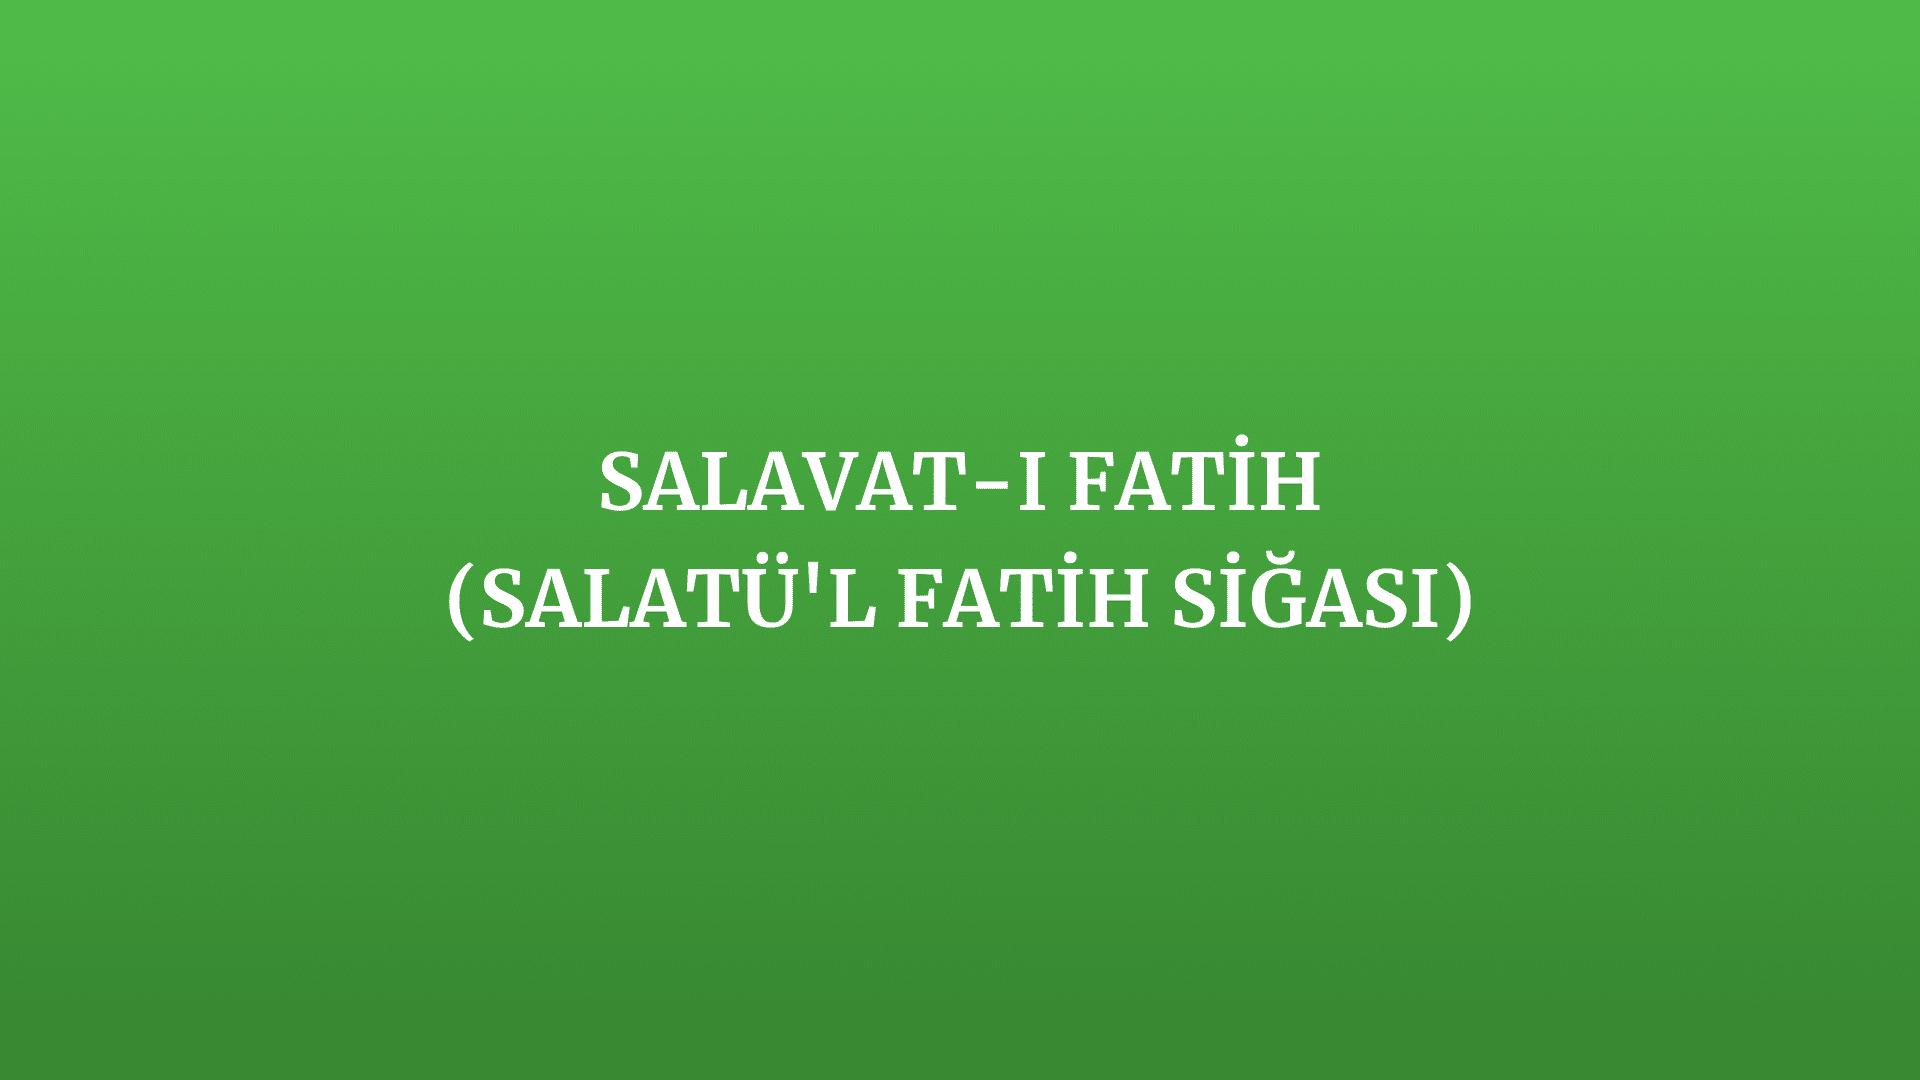 Salavat-ı Fatih (Salatü'l Fatih Siğası)